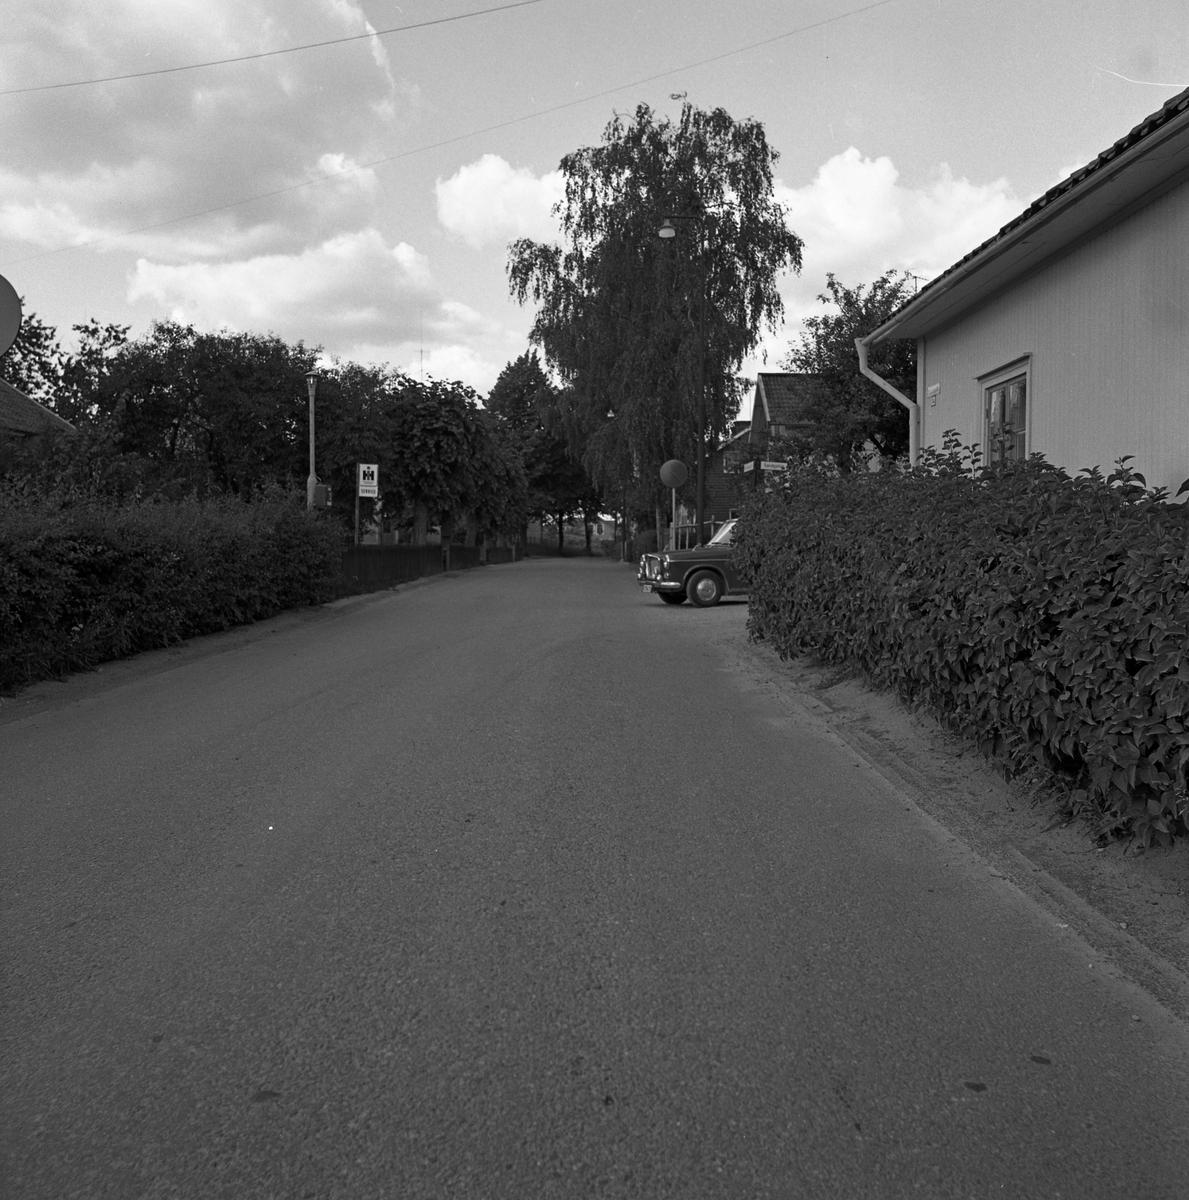 Brunnsängsgatan - Sandgatan Bebyggelse